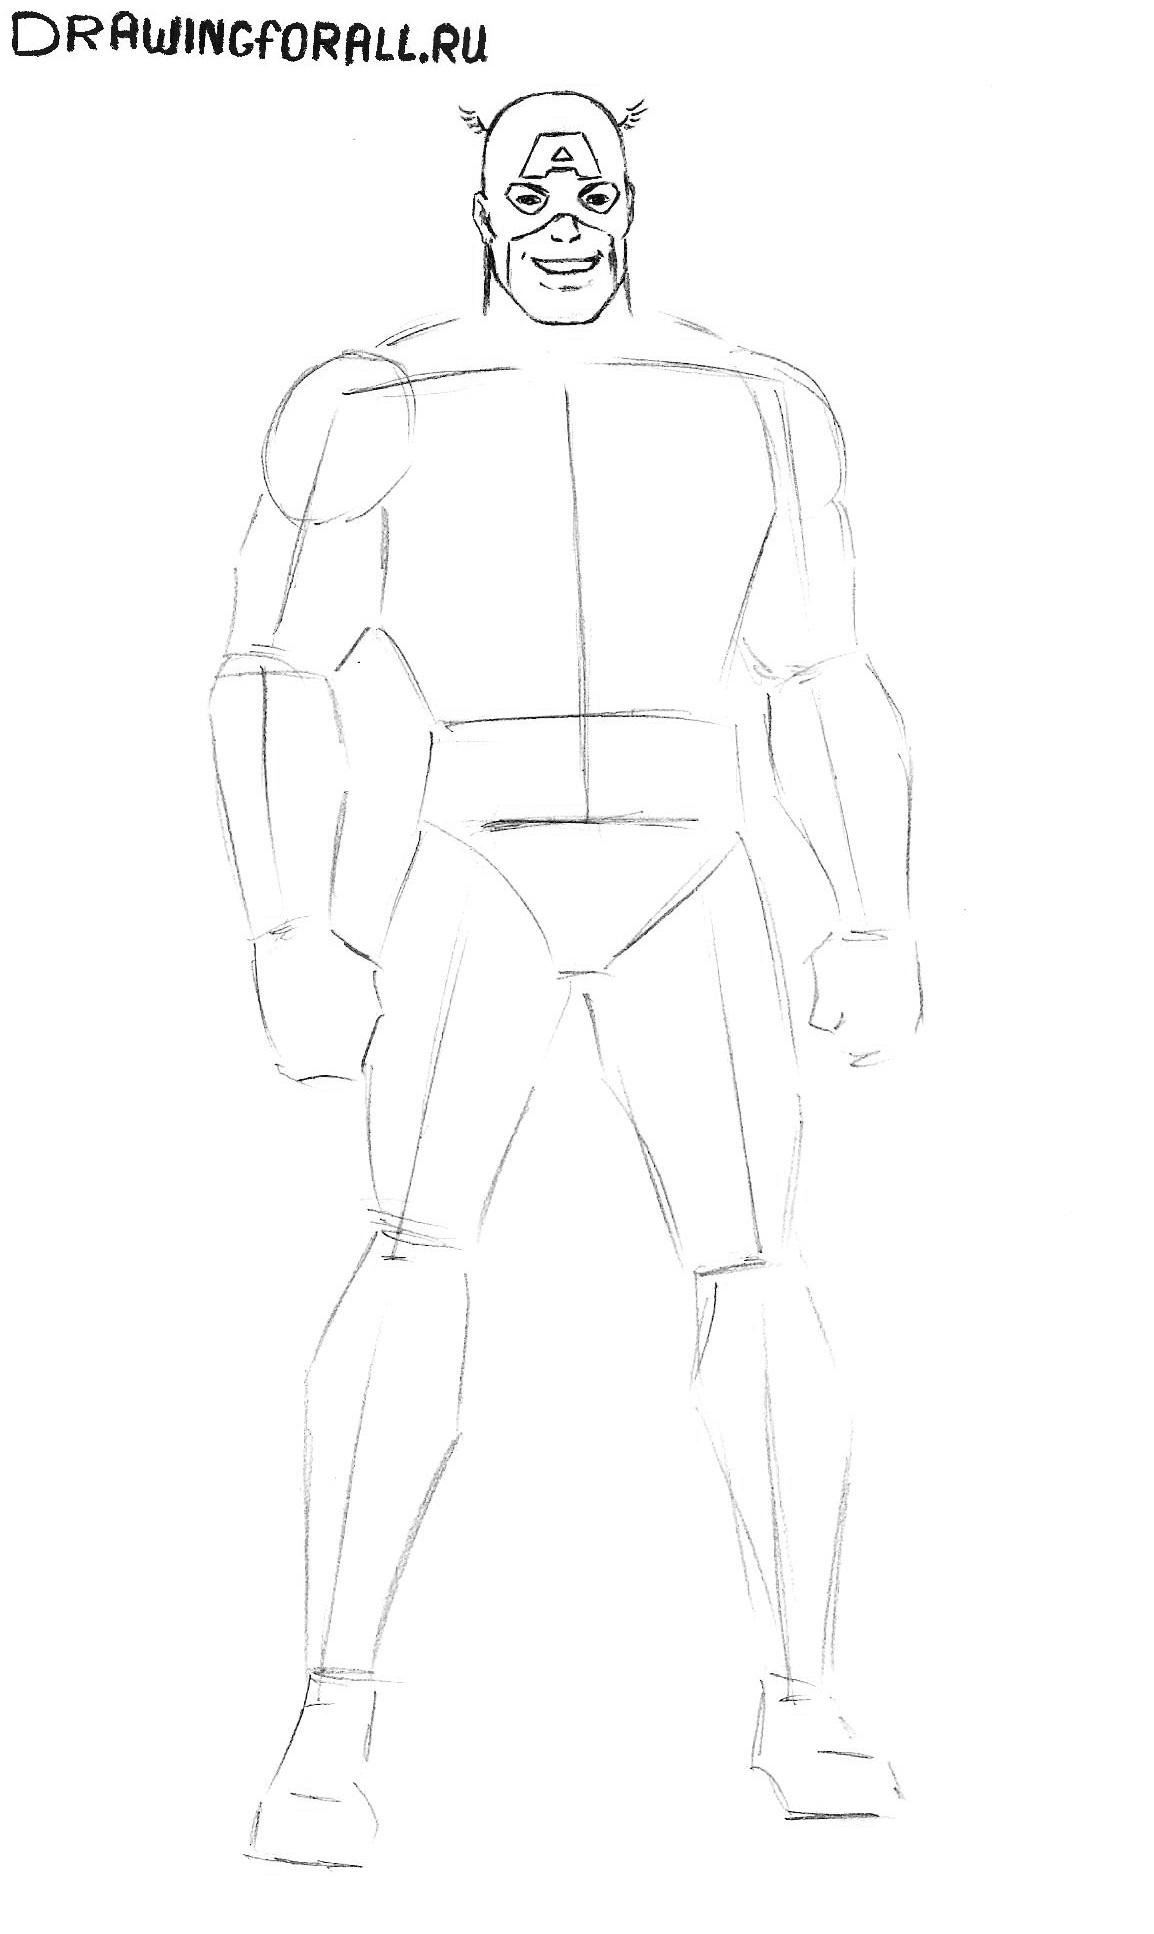 Капитан Америка нарисованный карандашом